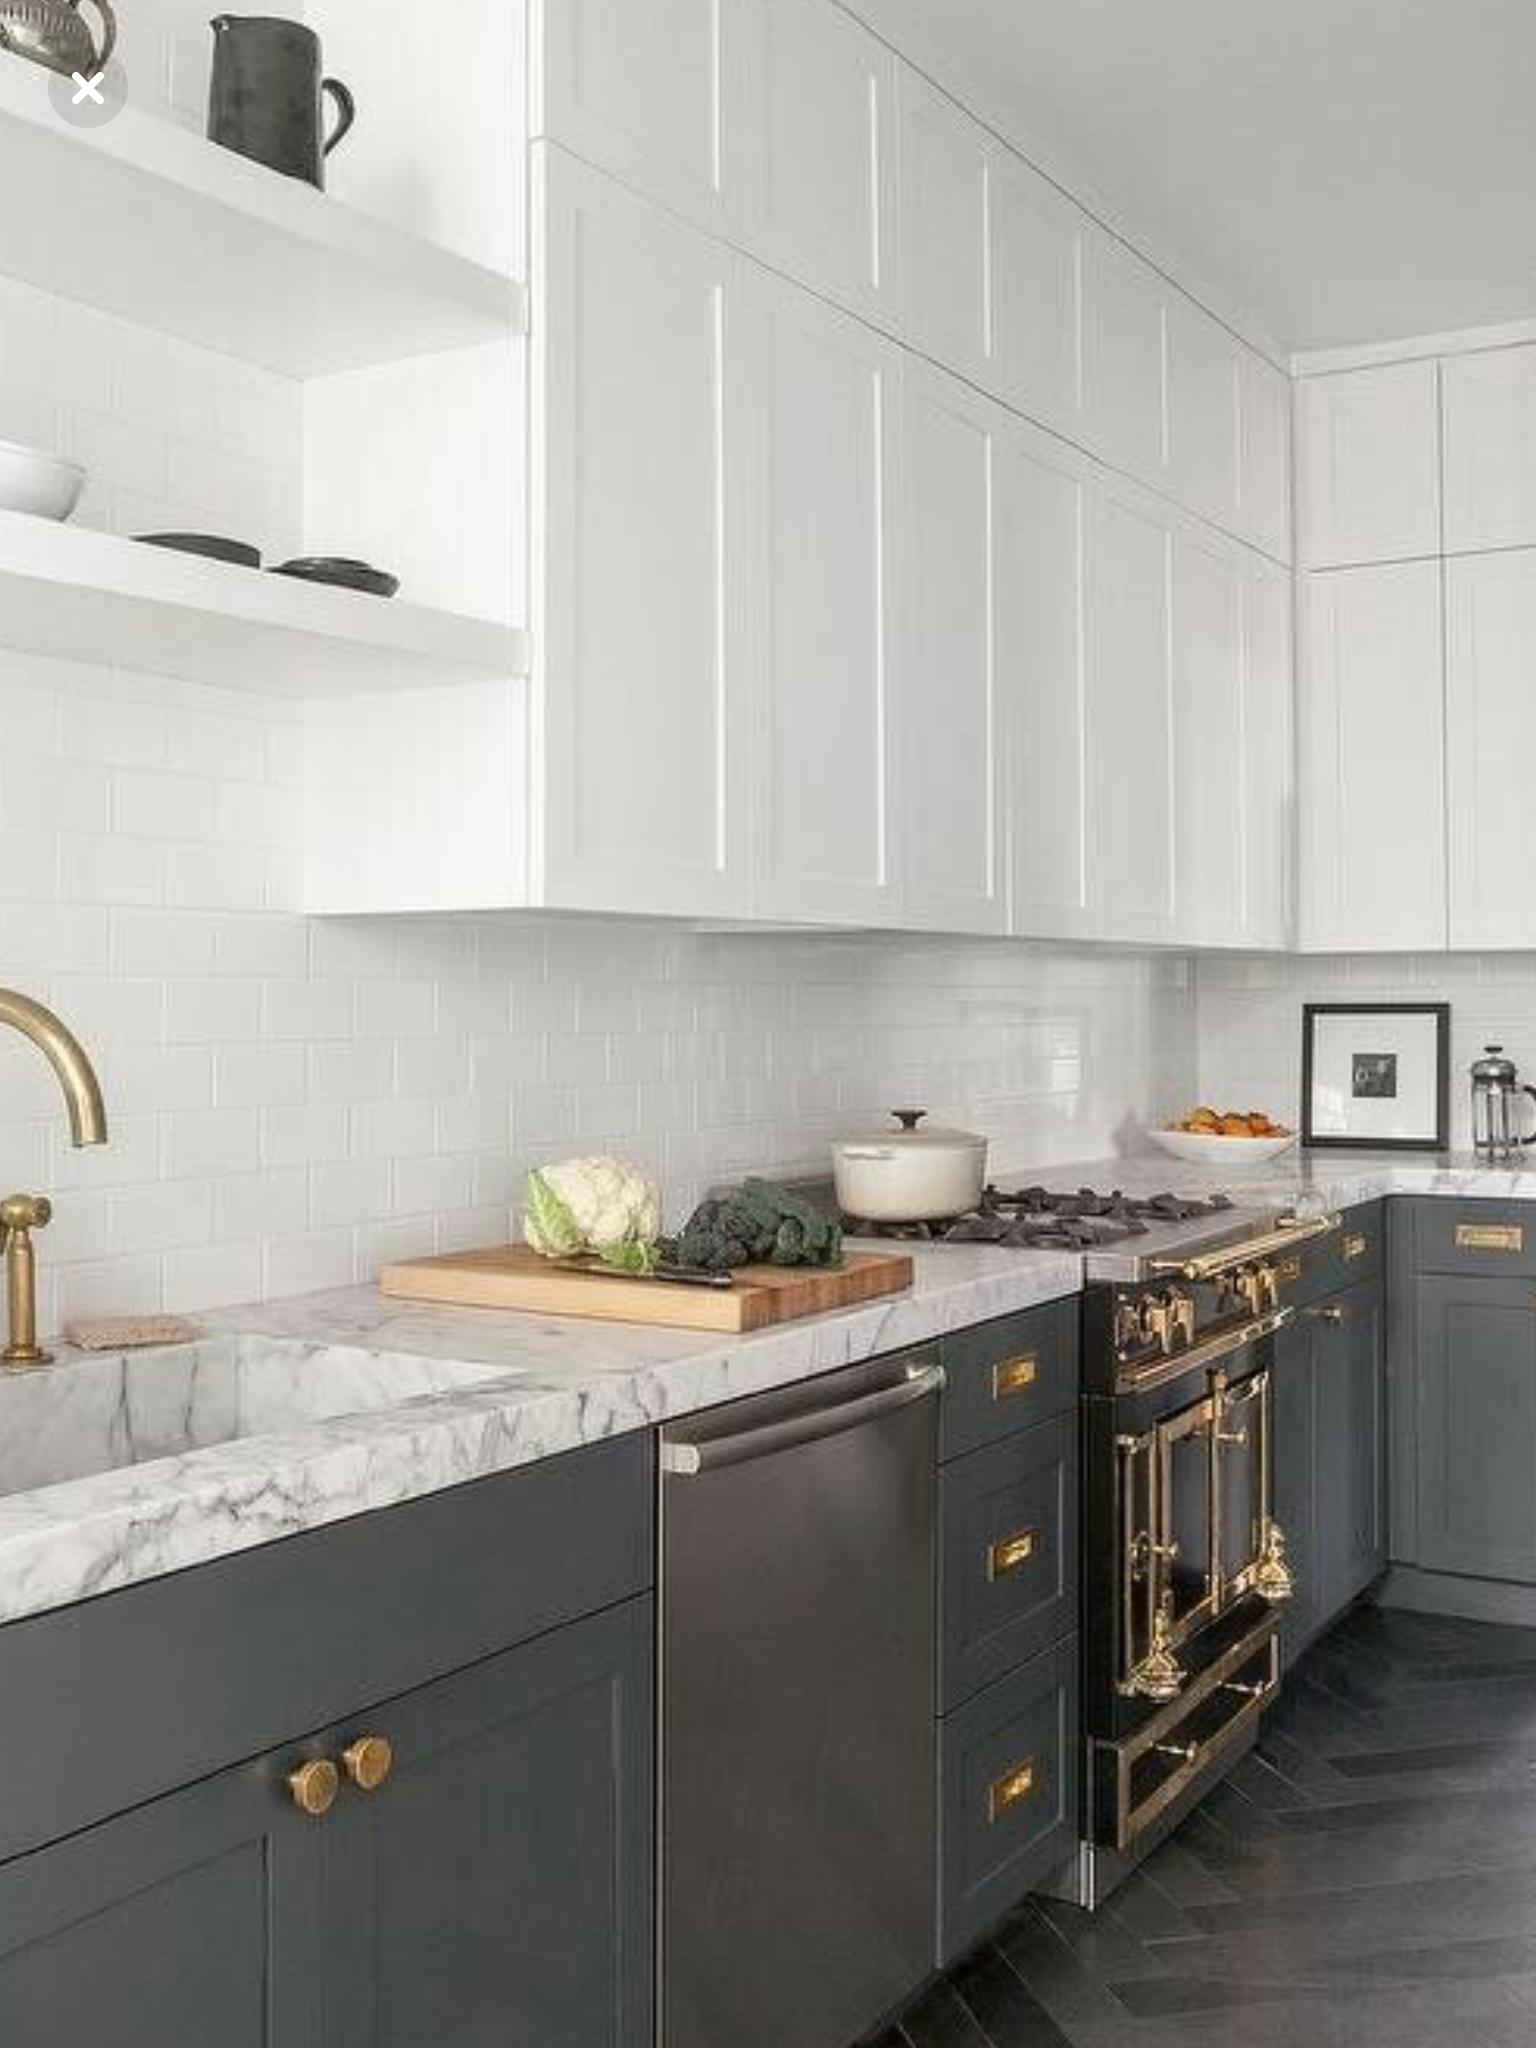 Pin By Kyra Delgadillo On Kitchen Kitchen Cabinet Design Kitchen Design Kitchen Renovation